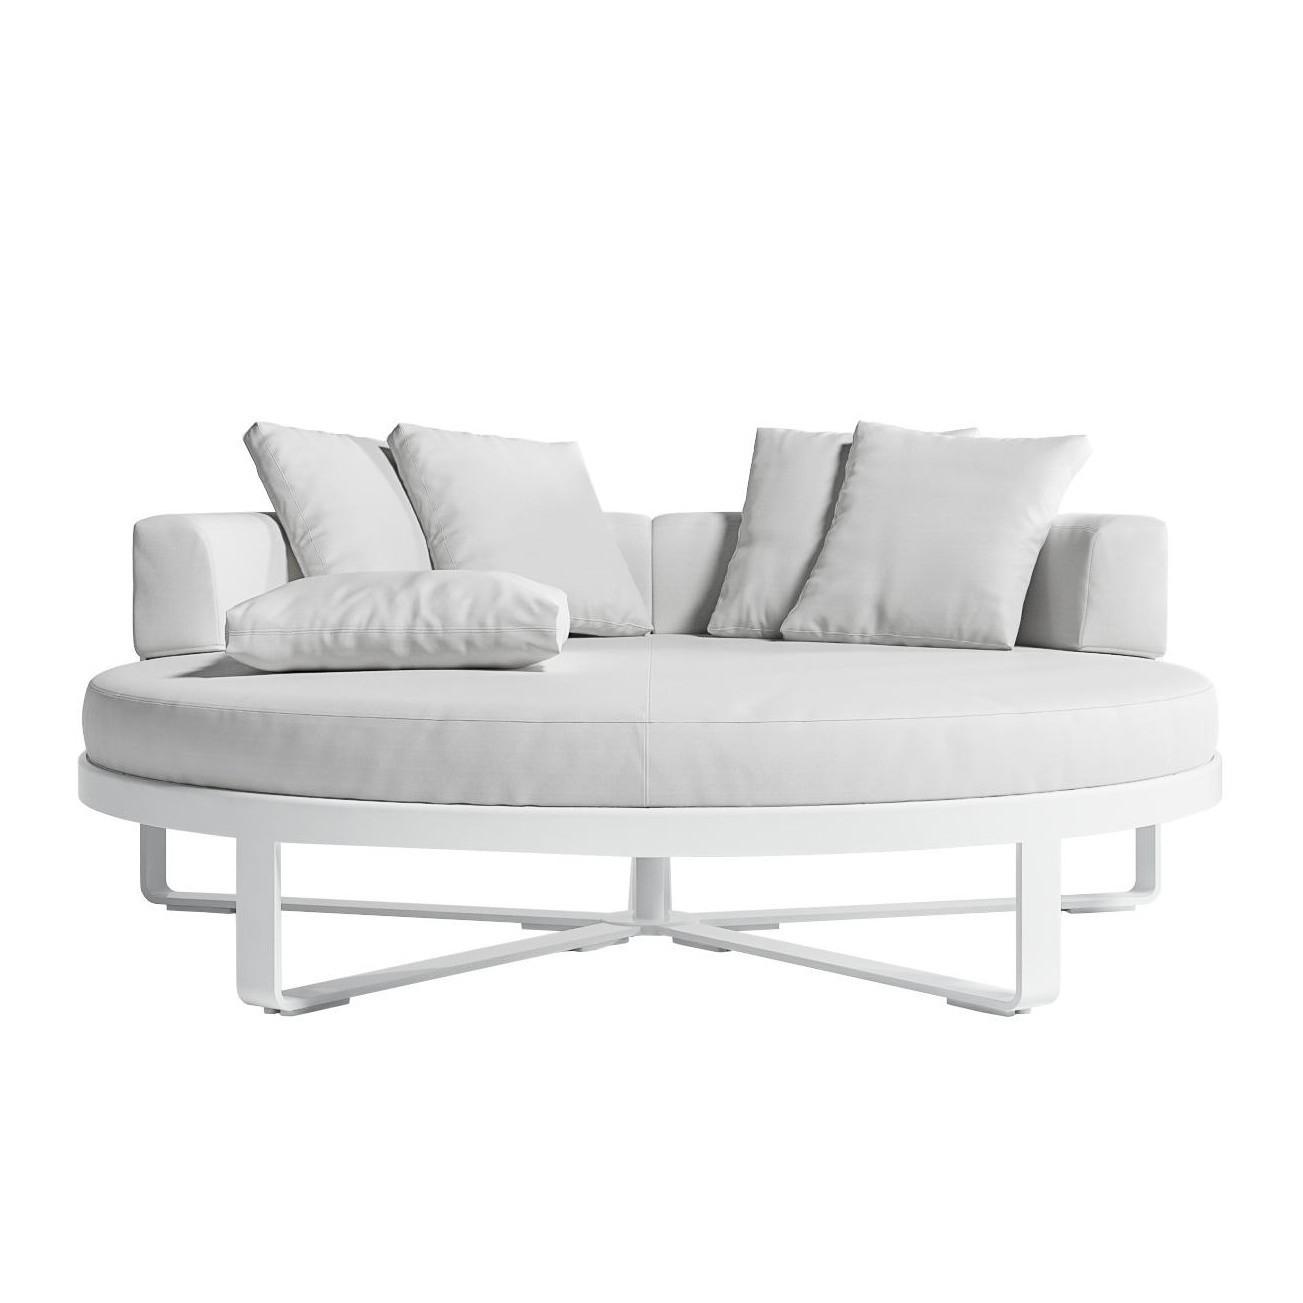 - Gandia Blasco Flat Outdoor Chill Bed Daybed Round AmbienteDirect